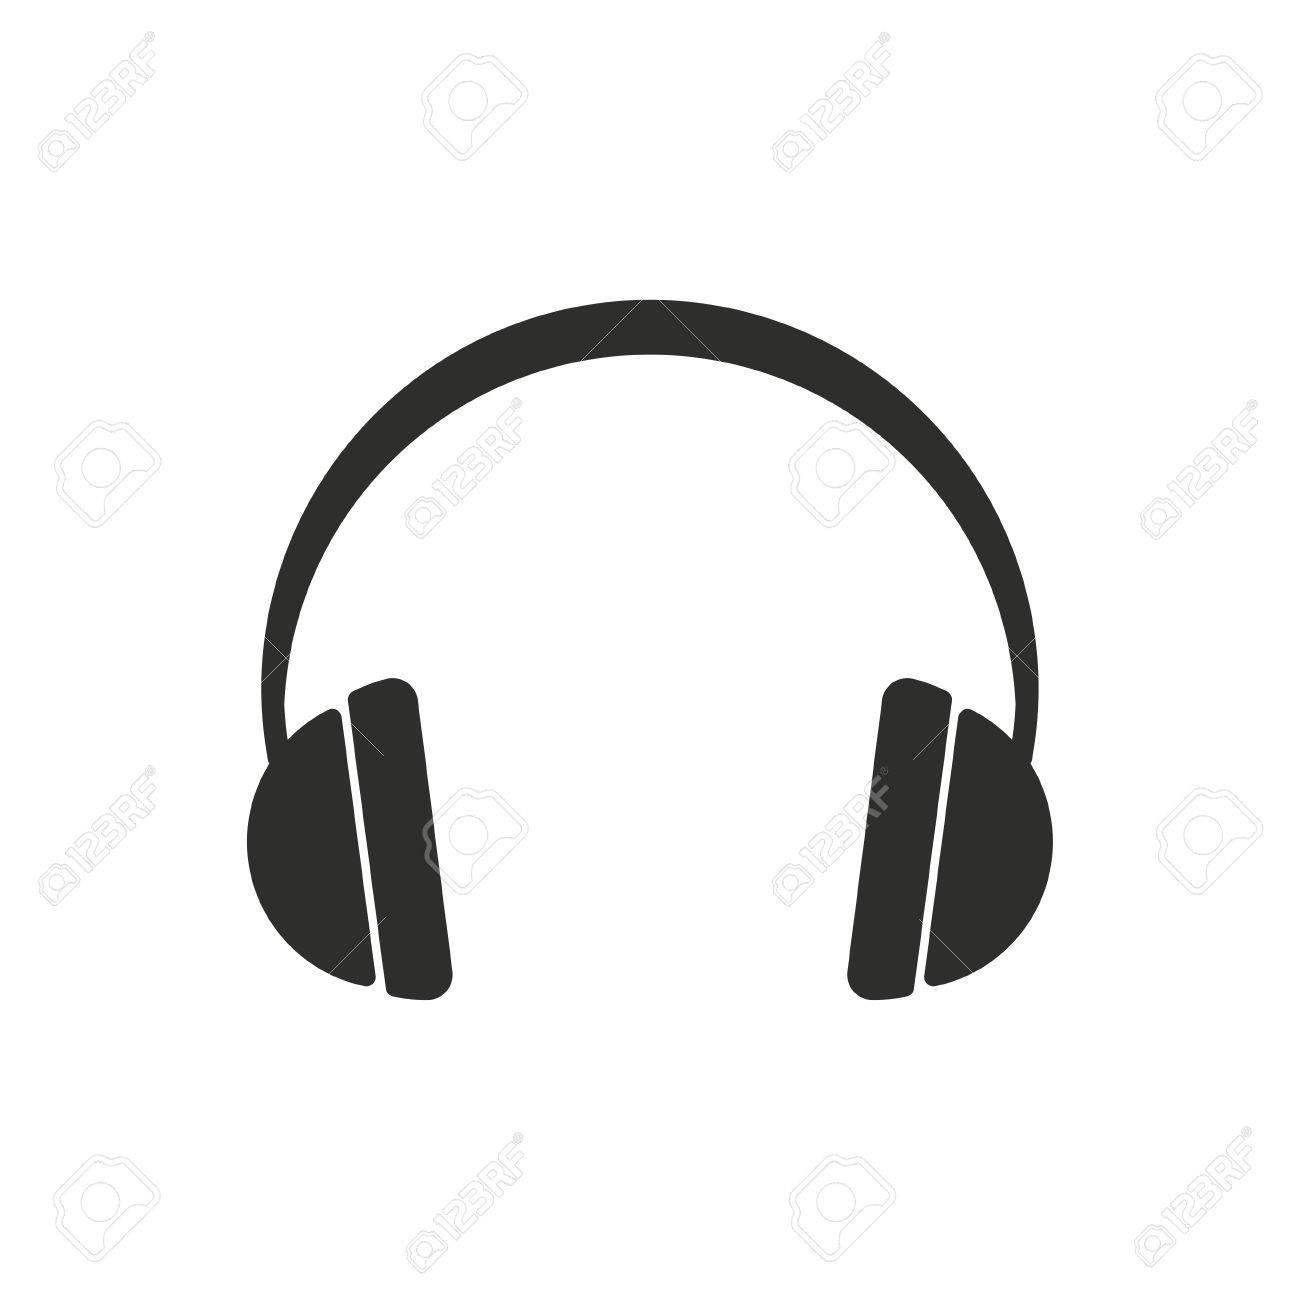 headphone vector icon black illustration isolated on white rh 123rf com headphone vector icon headphone vector art